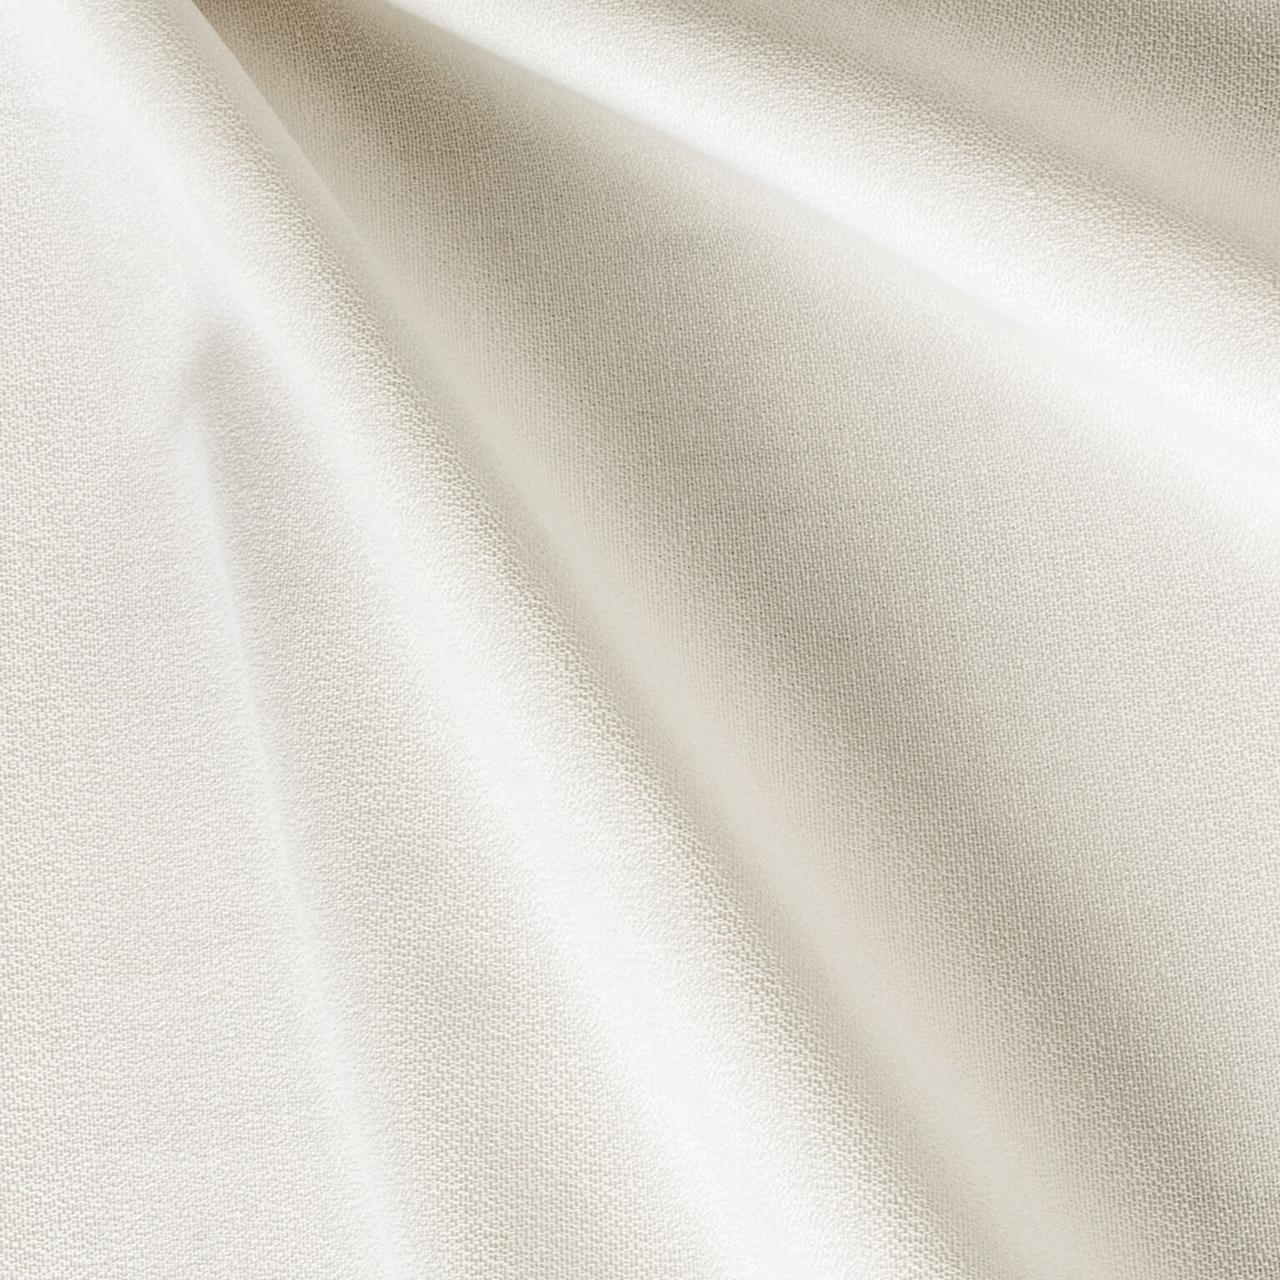 Ткань для скатертей и салфеток (ресторан) 400287 v2